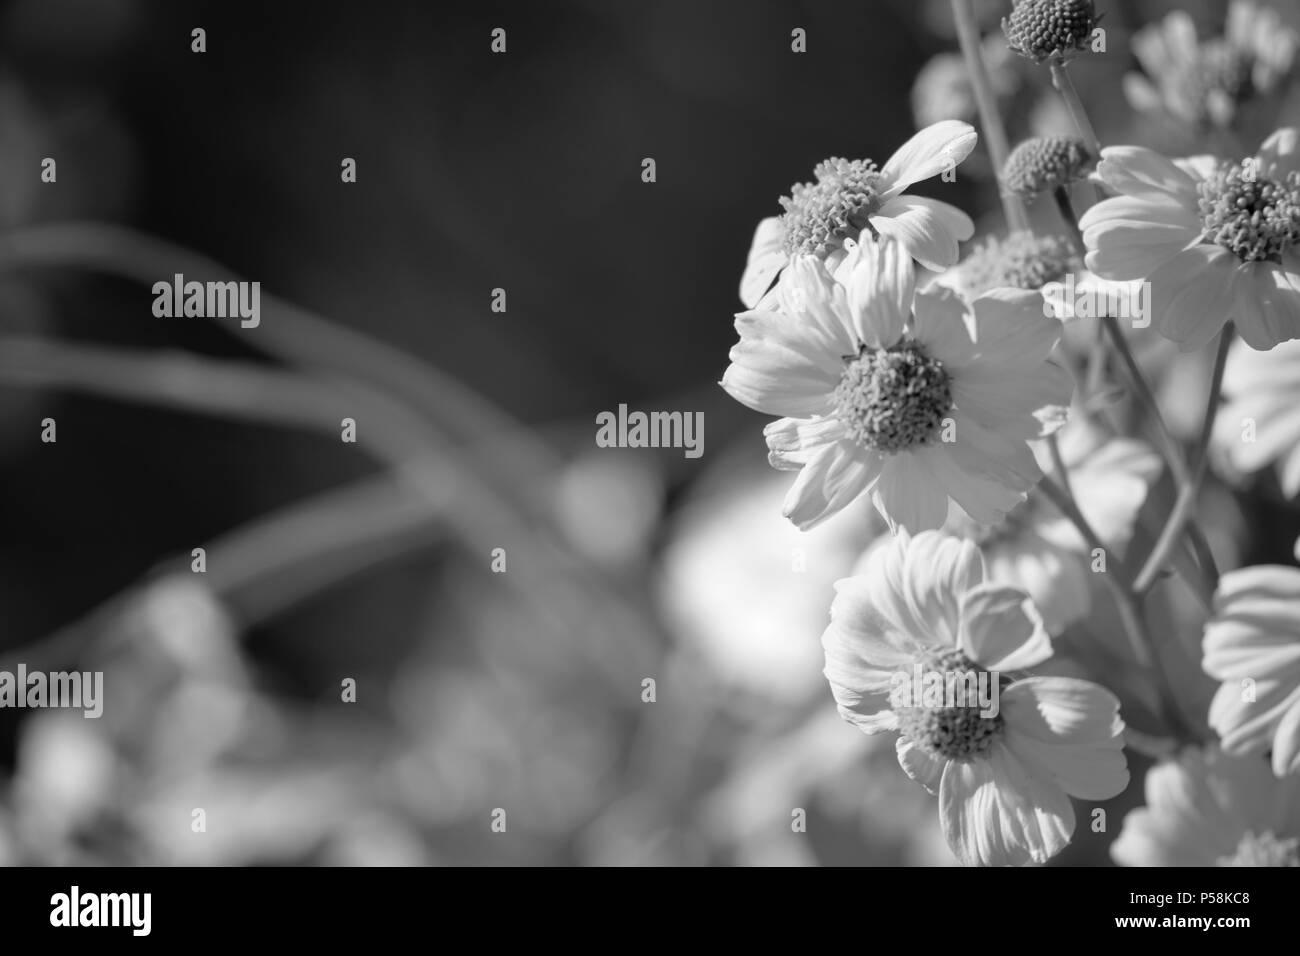 Off Center Black And White Flower Stock Photos & Off Center Black ...